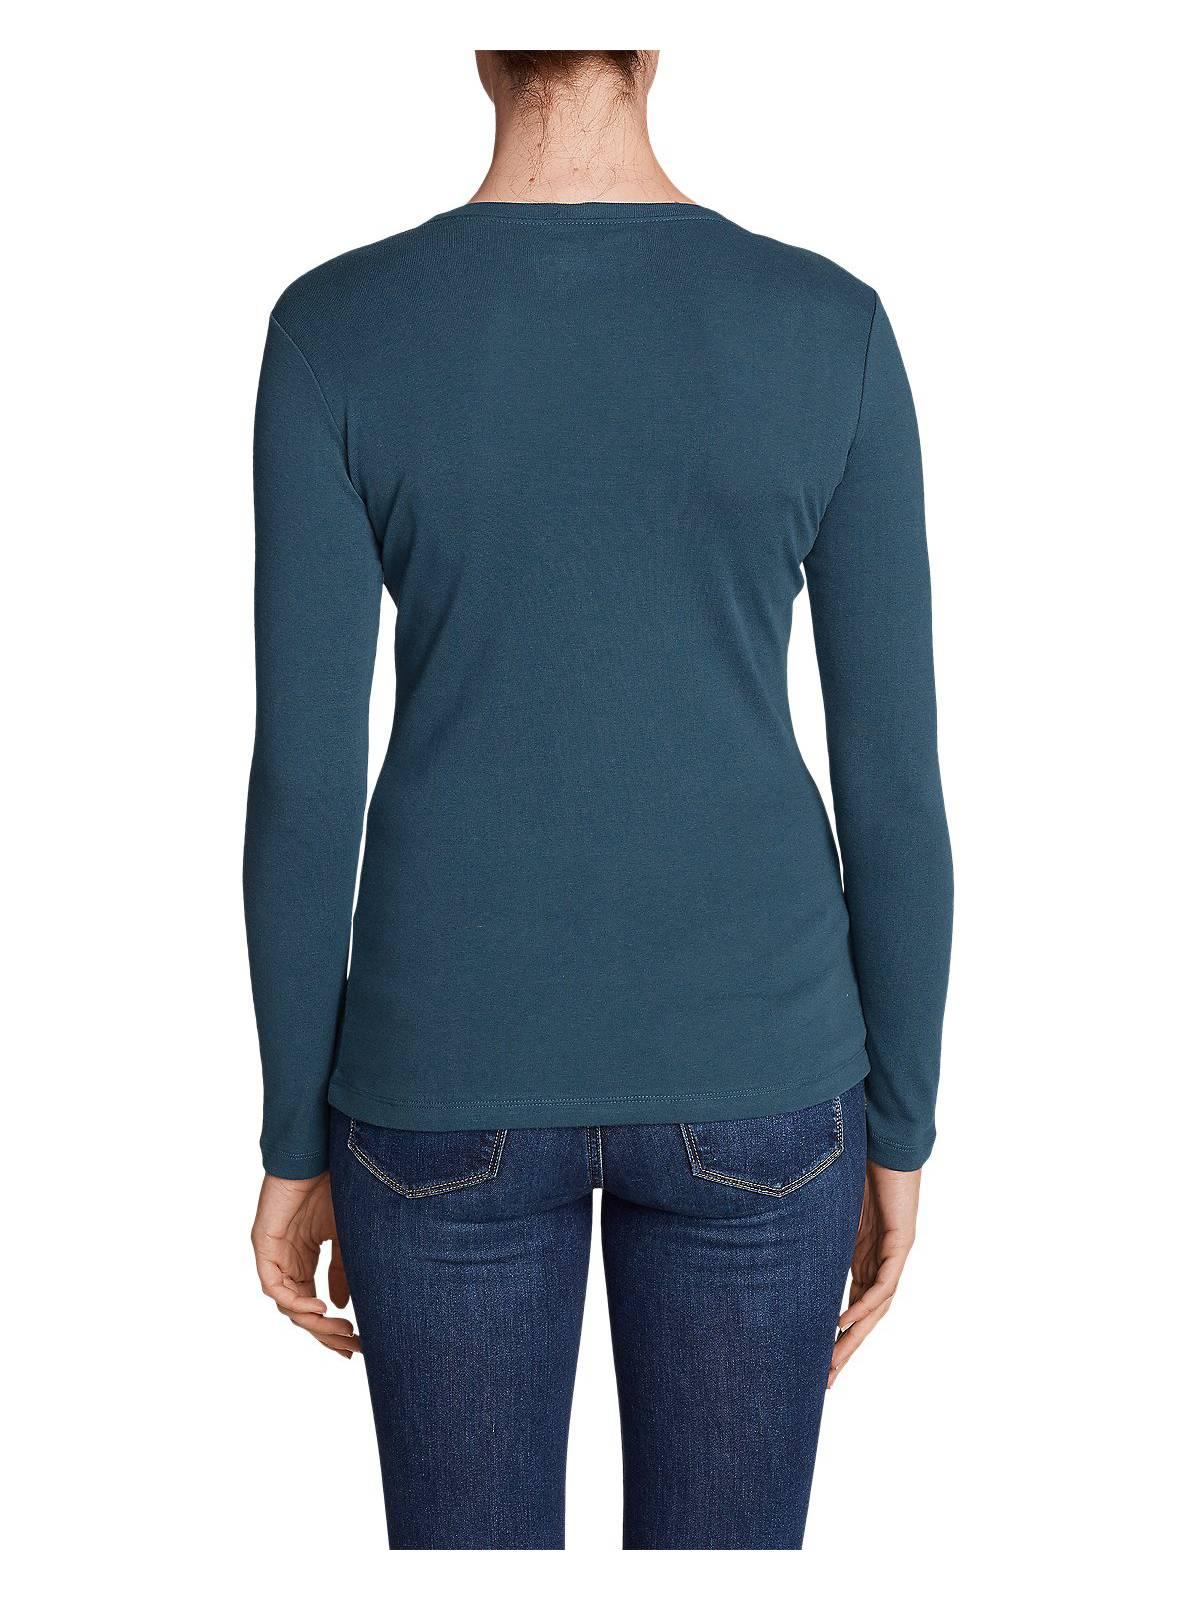 Eddie-Bauer-Women-039-s-Favorite-Long-Sleeve-V-Neck-T-Shirt thumbnail 10